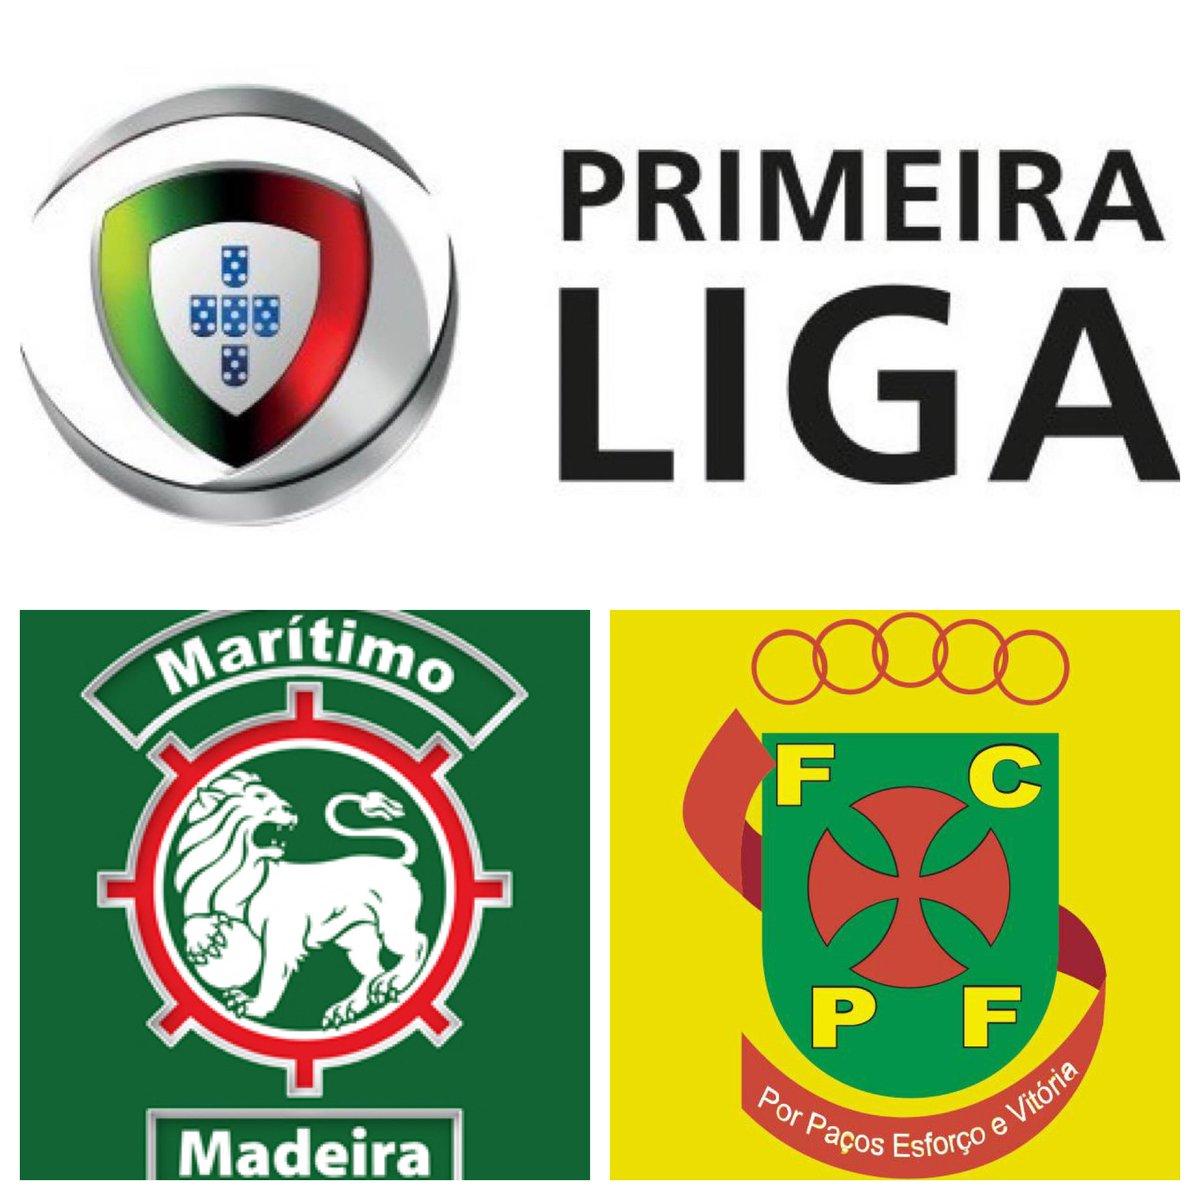 #IESRSN #Ferreira @ #Maritimo is underway! #PortugueseLiga